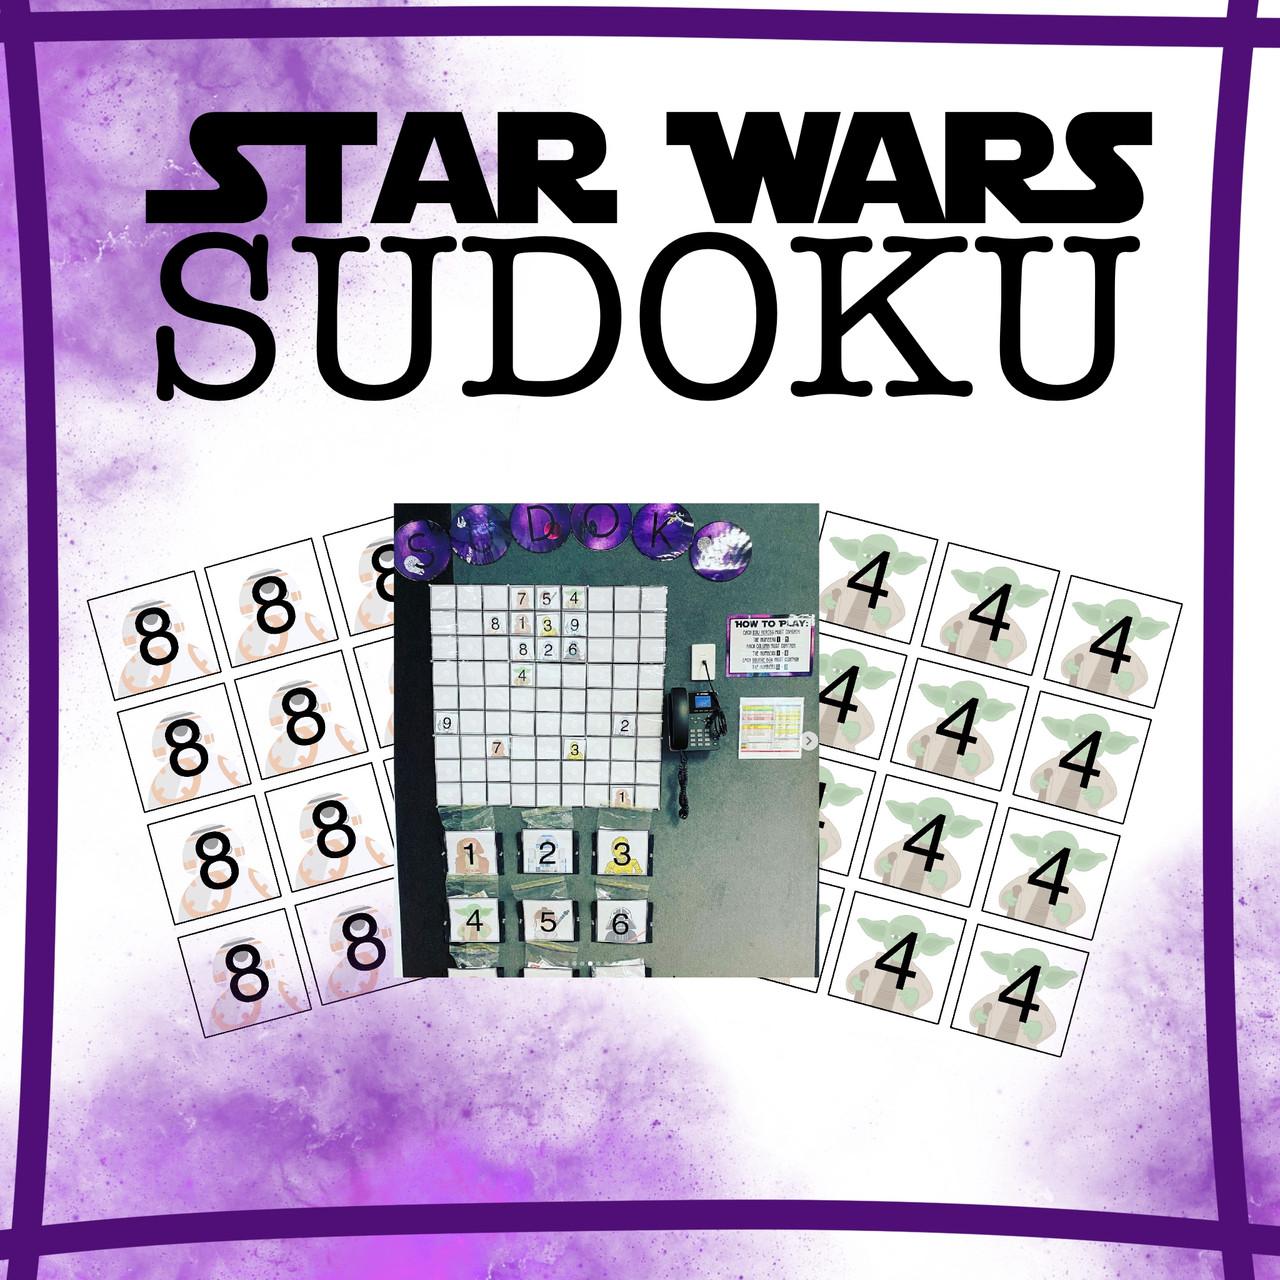 Large Interactive Star Wars Sudoku